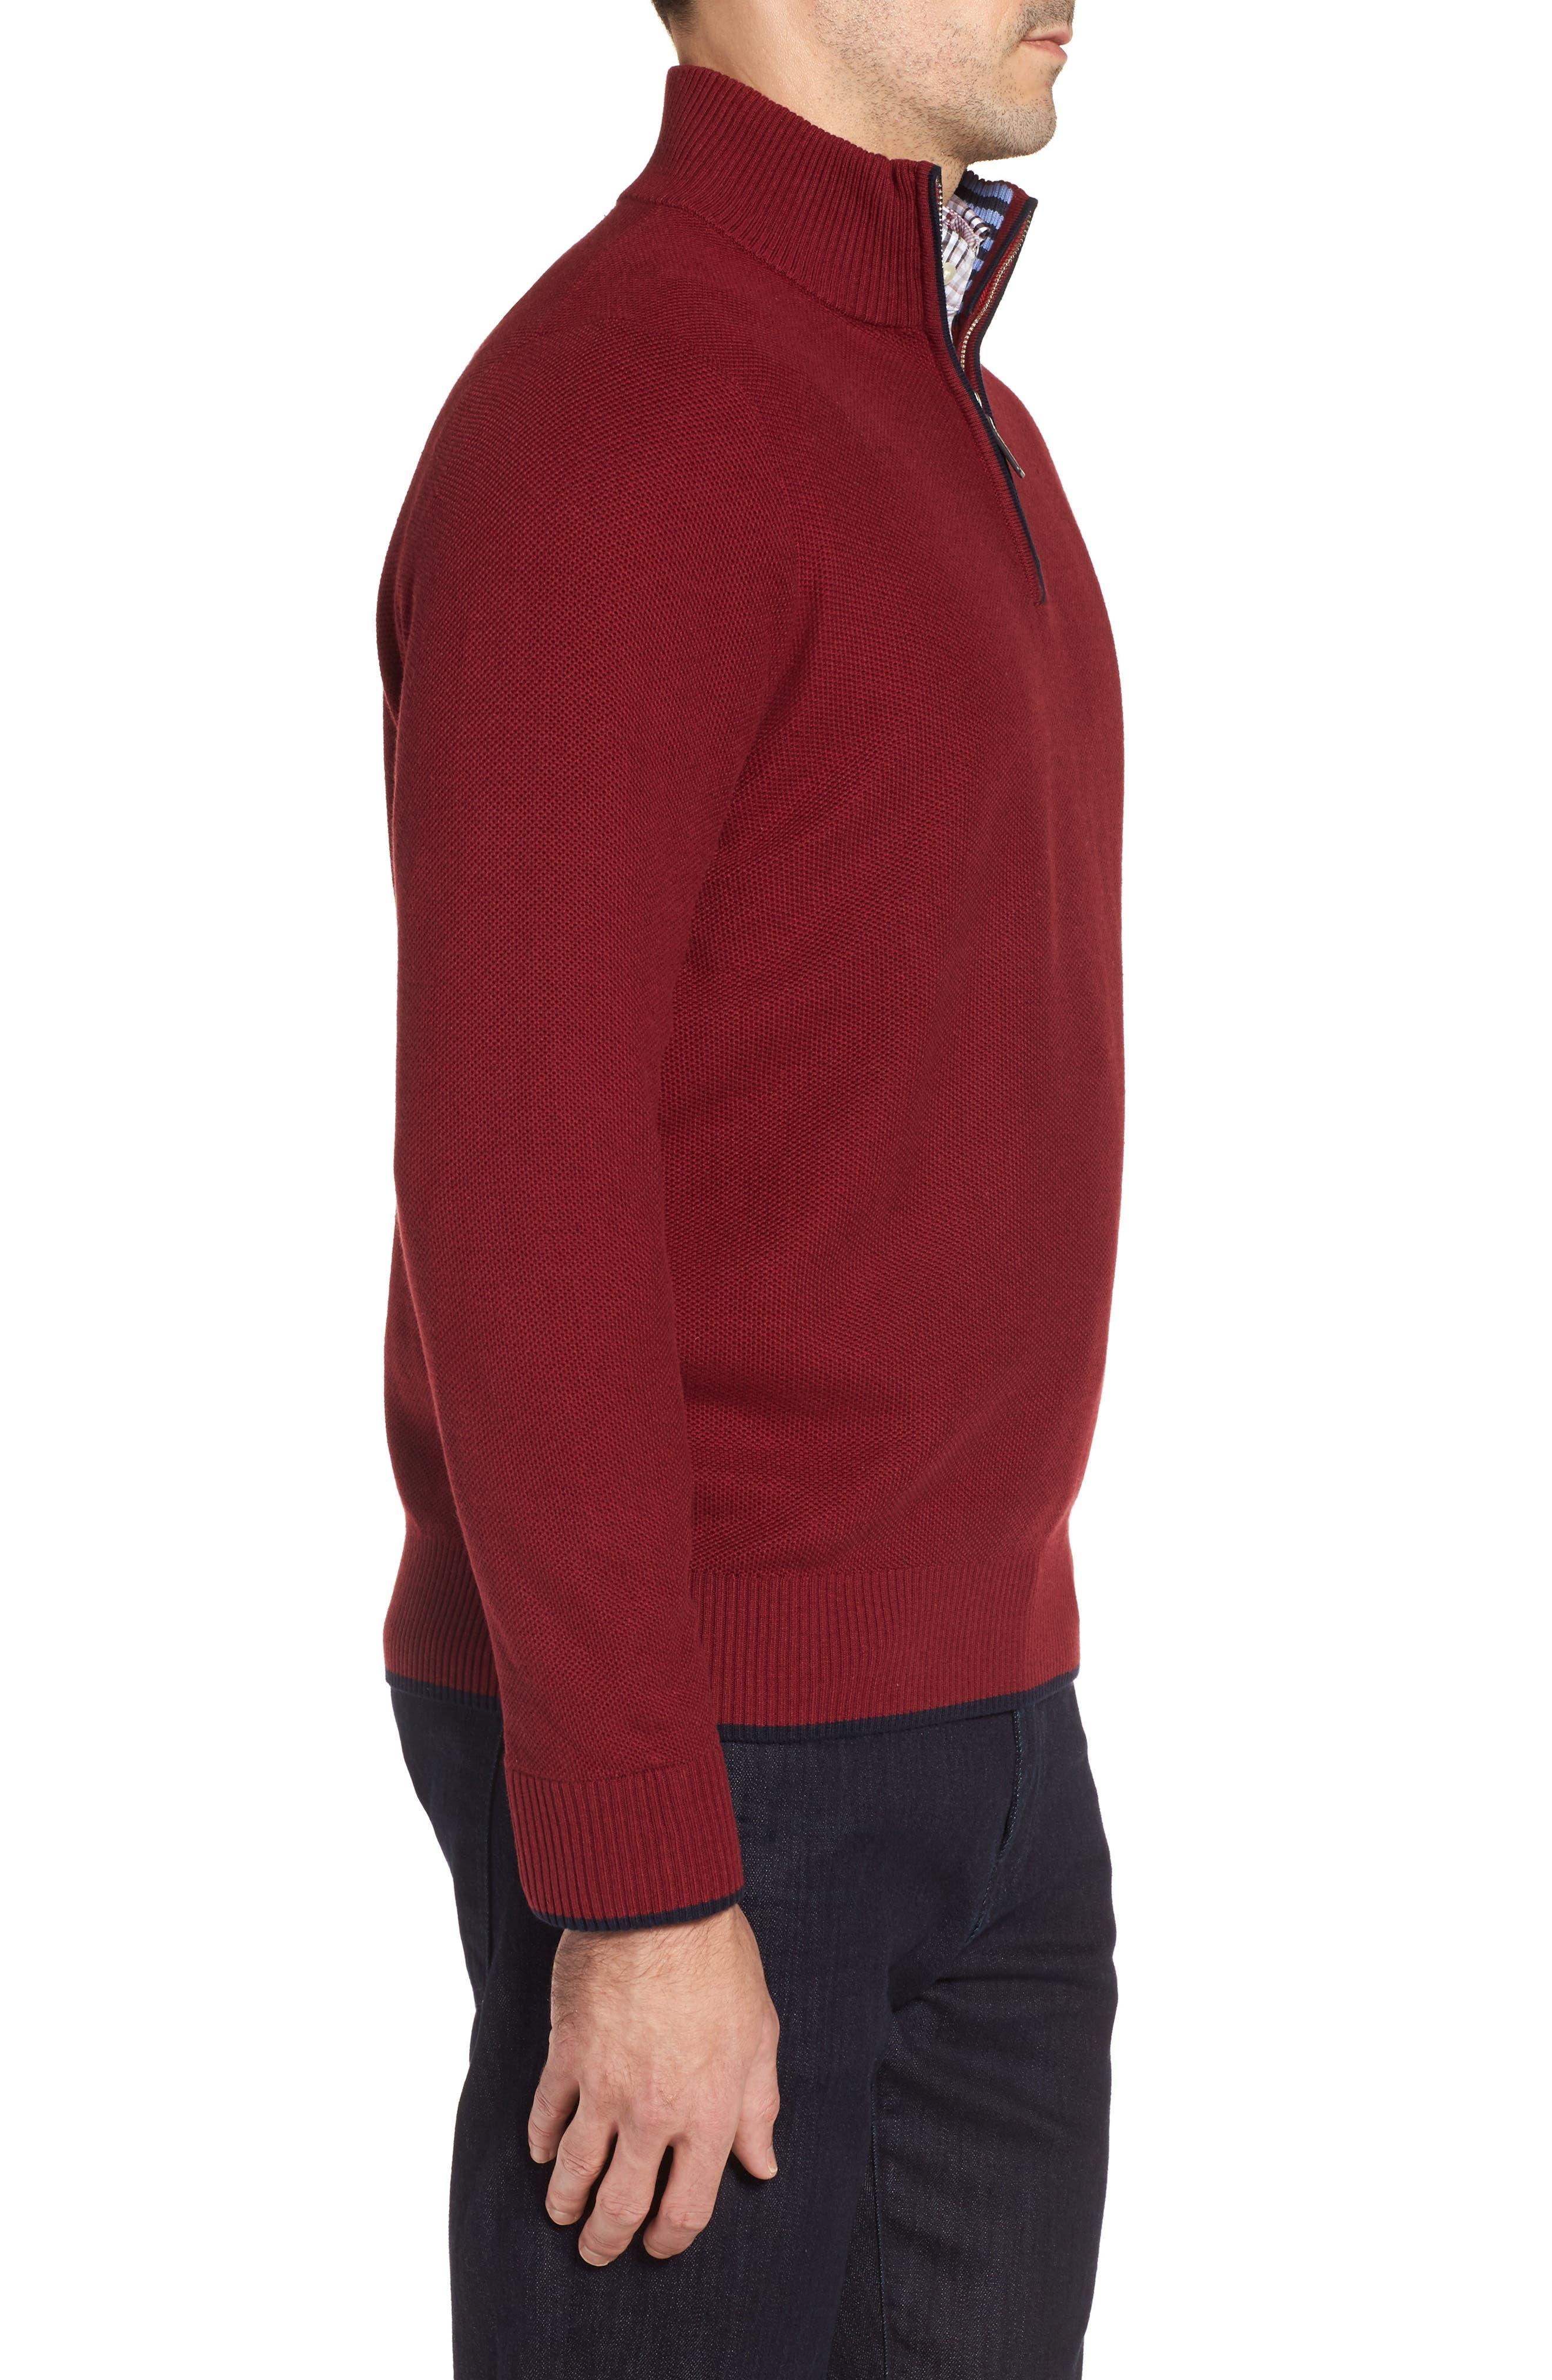 Prien Tipped Quarter Zip Sweater,                             Alternate thumbnail 3, color,                             600